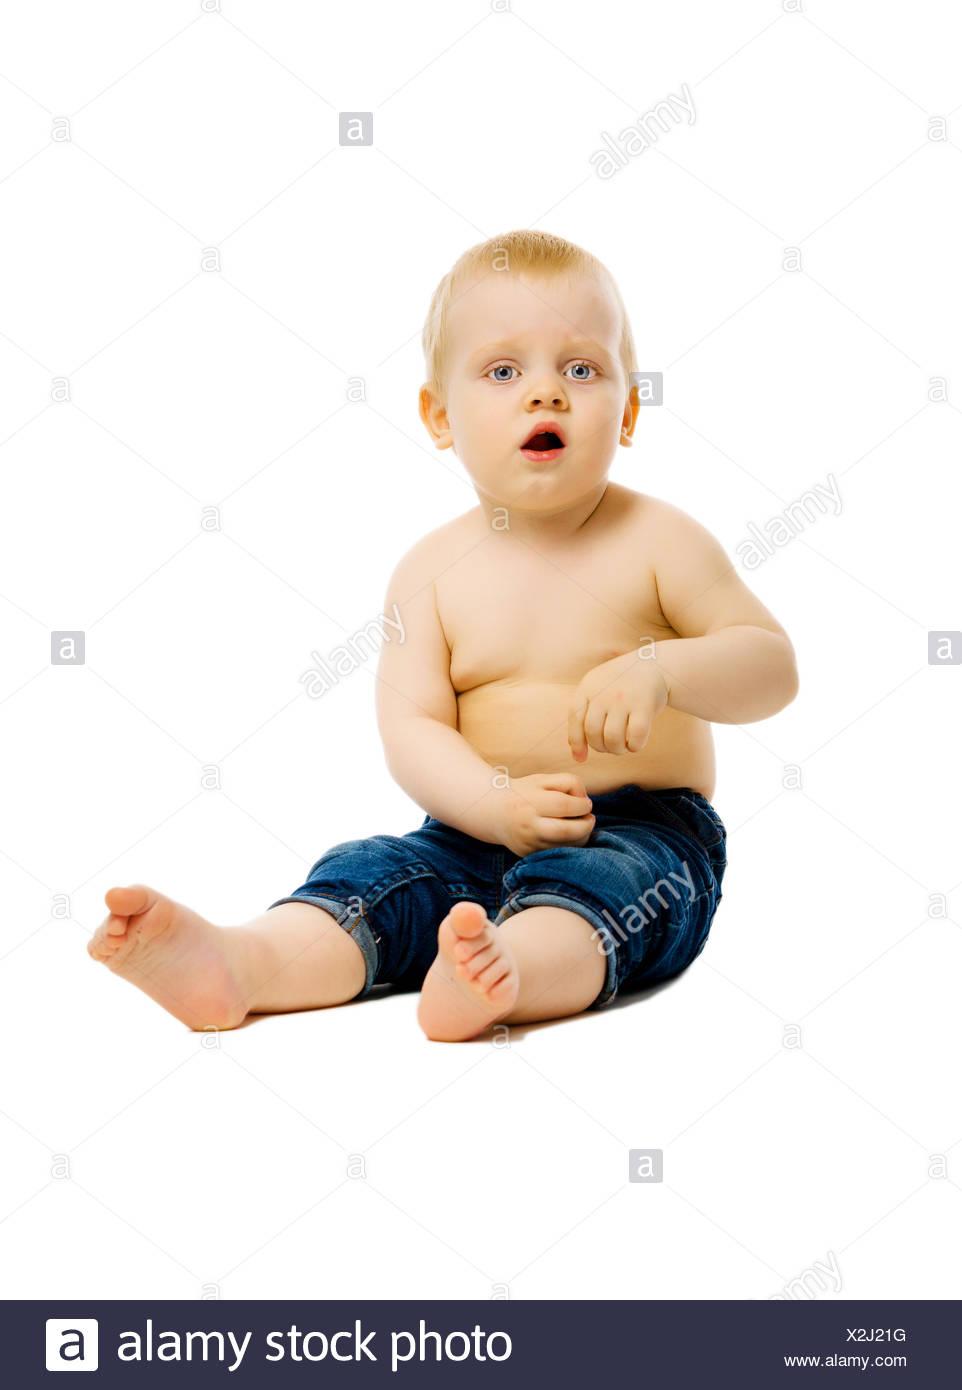 baby sitting on the floor. Studio. isolated - Stock Image